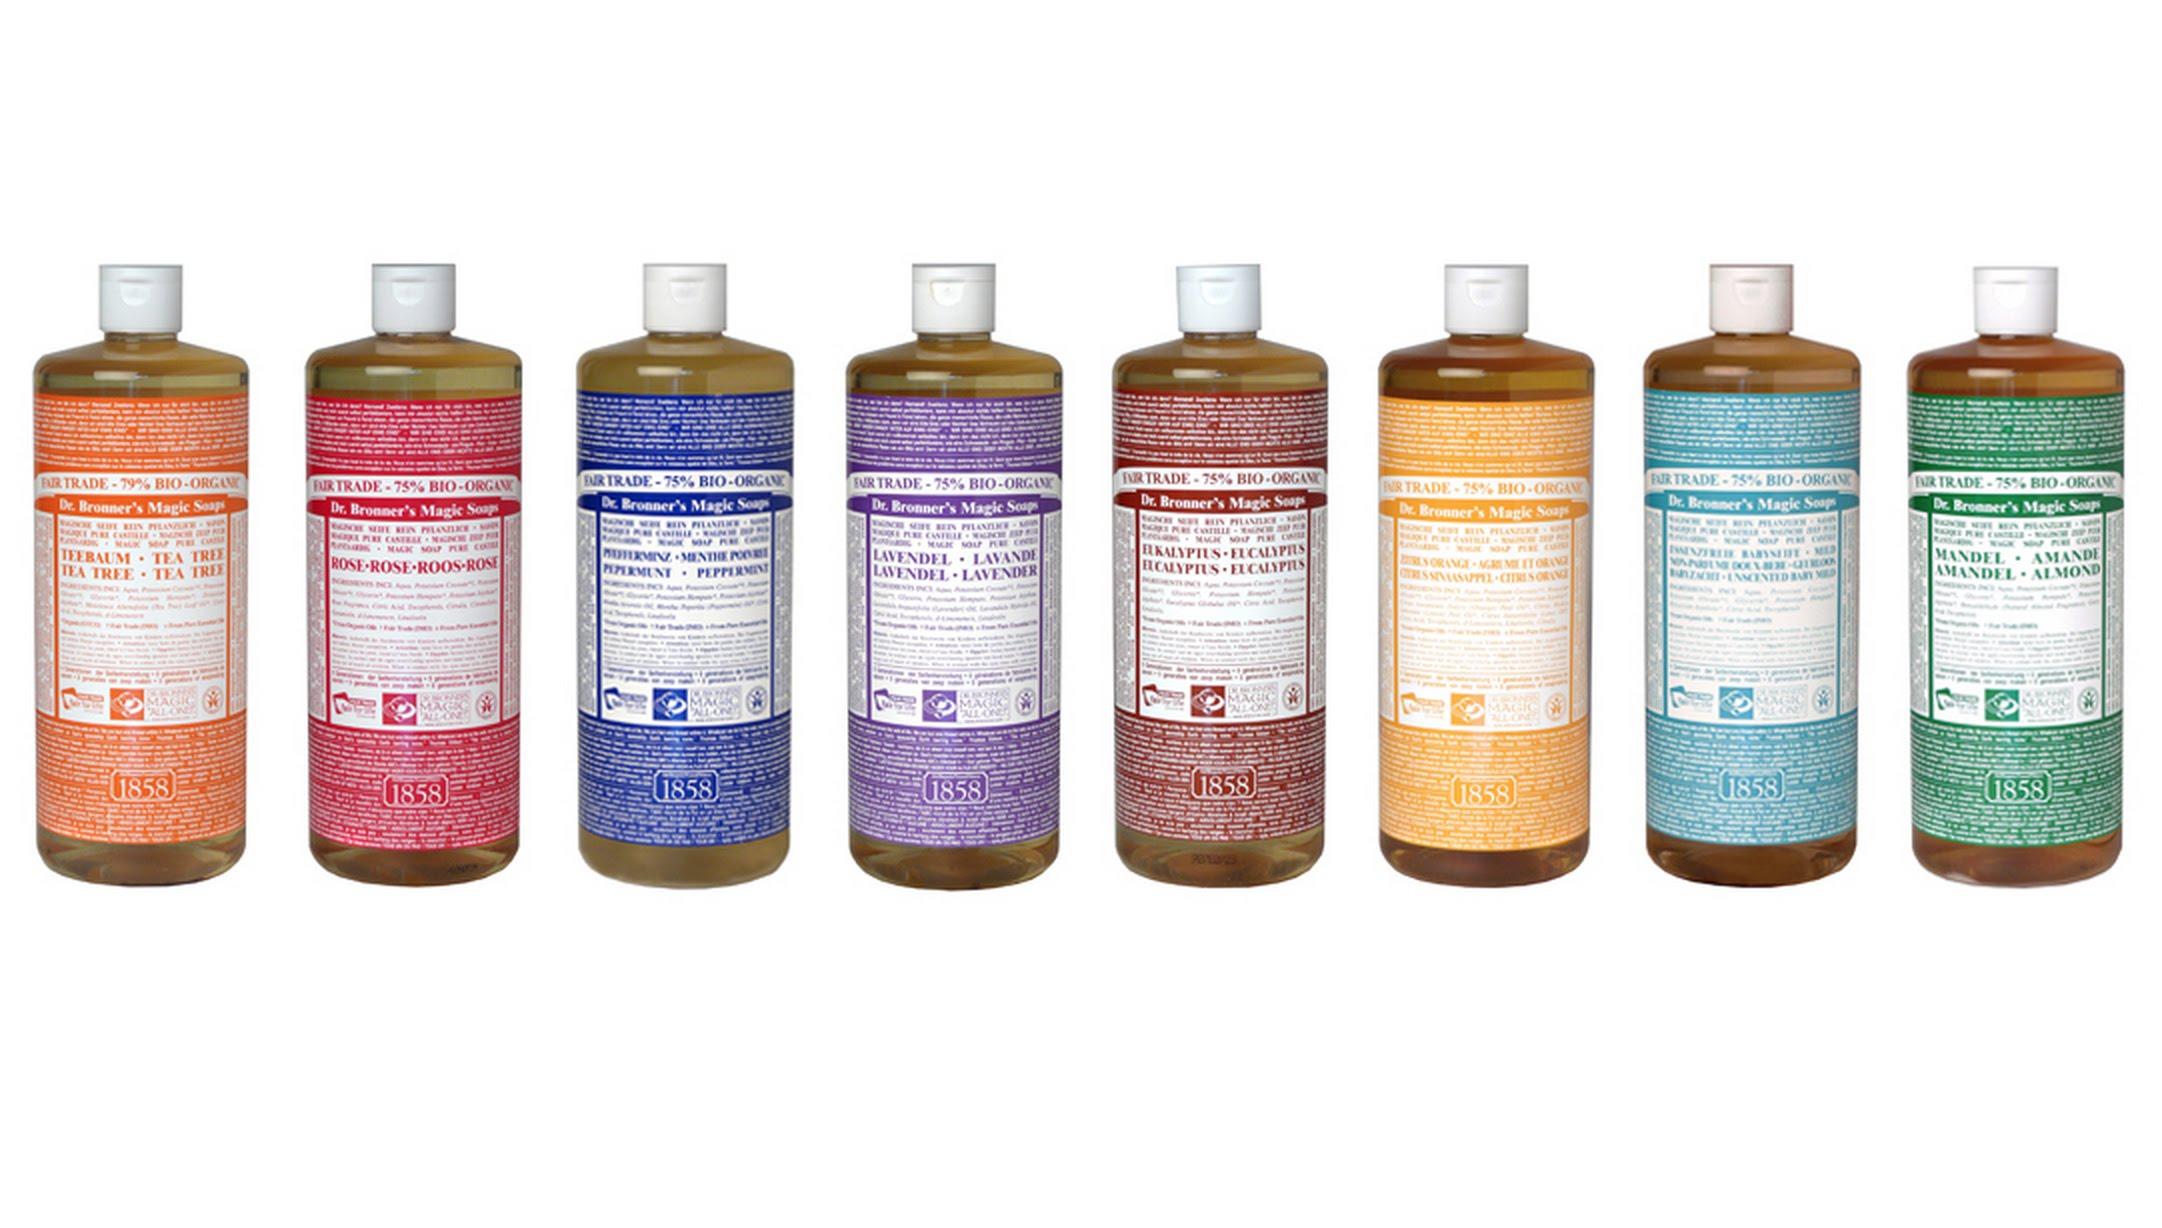 Dr. Bronner's Pure-Castille Soap